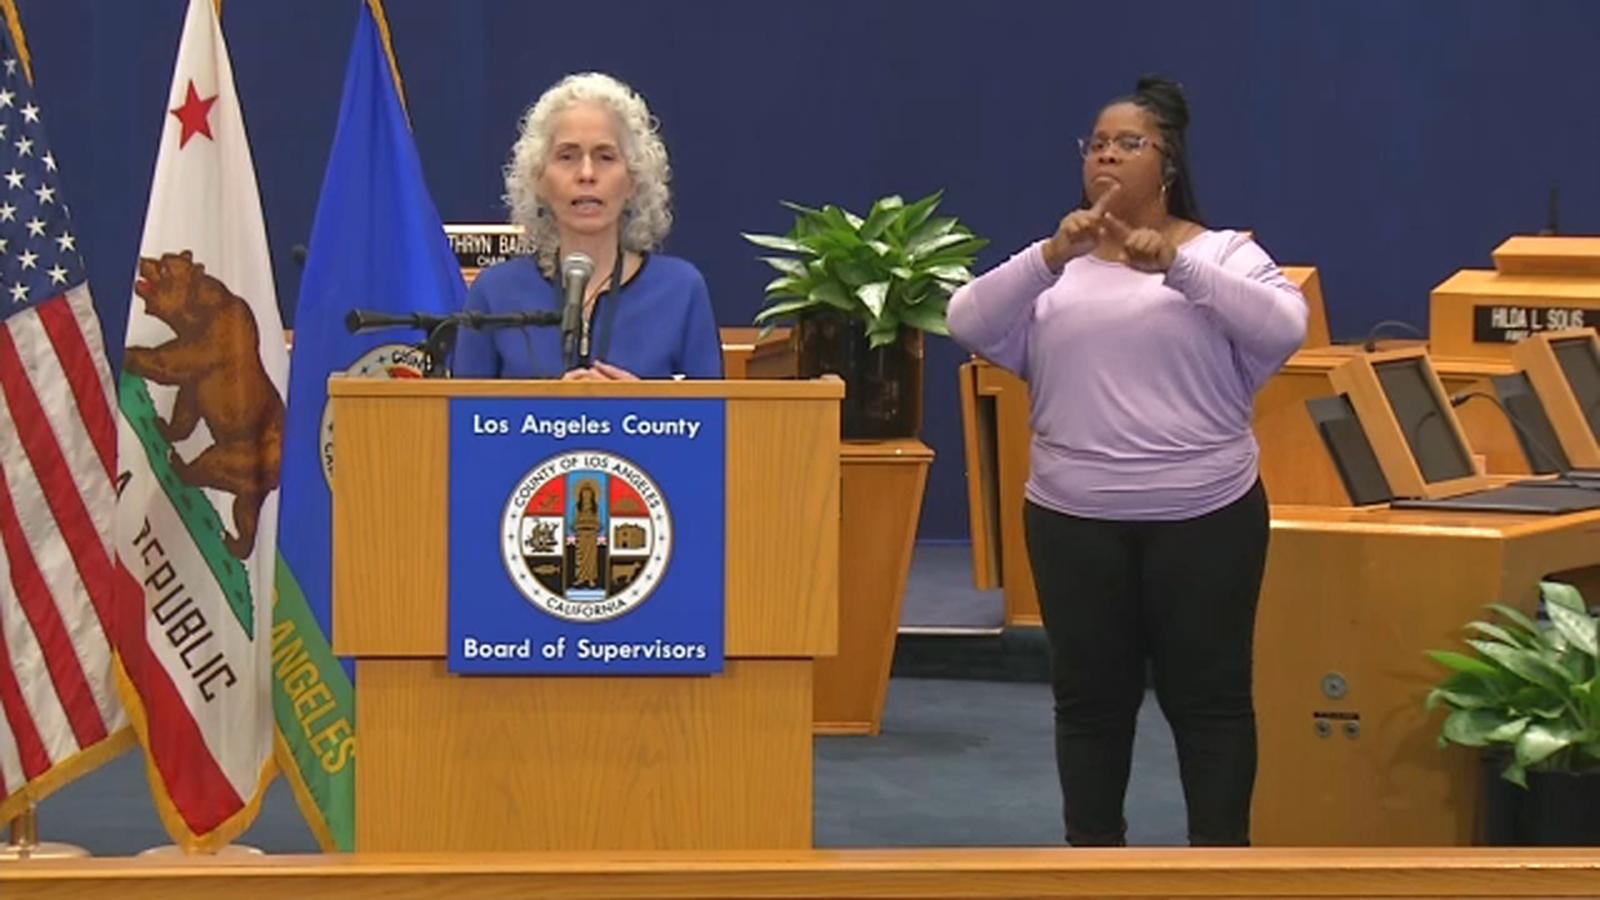 county public health director Dr. Barbara Ferrer